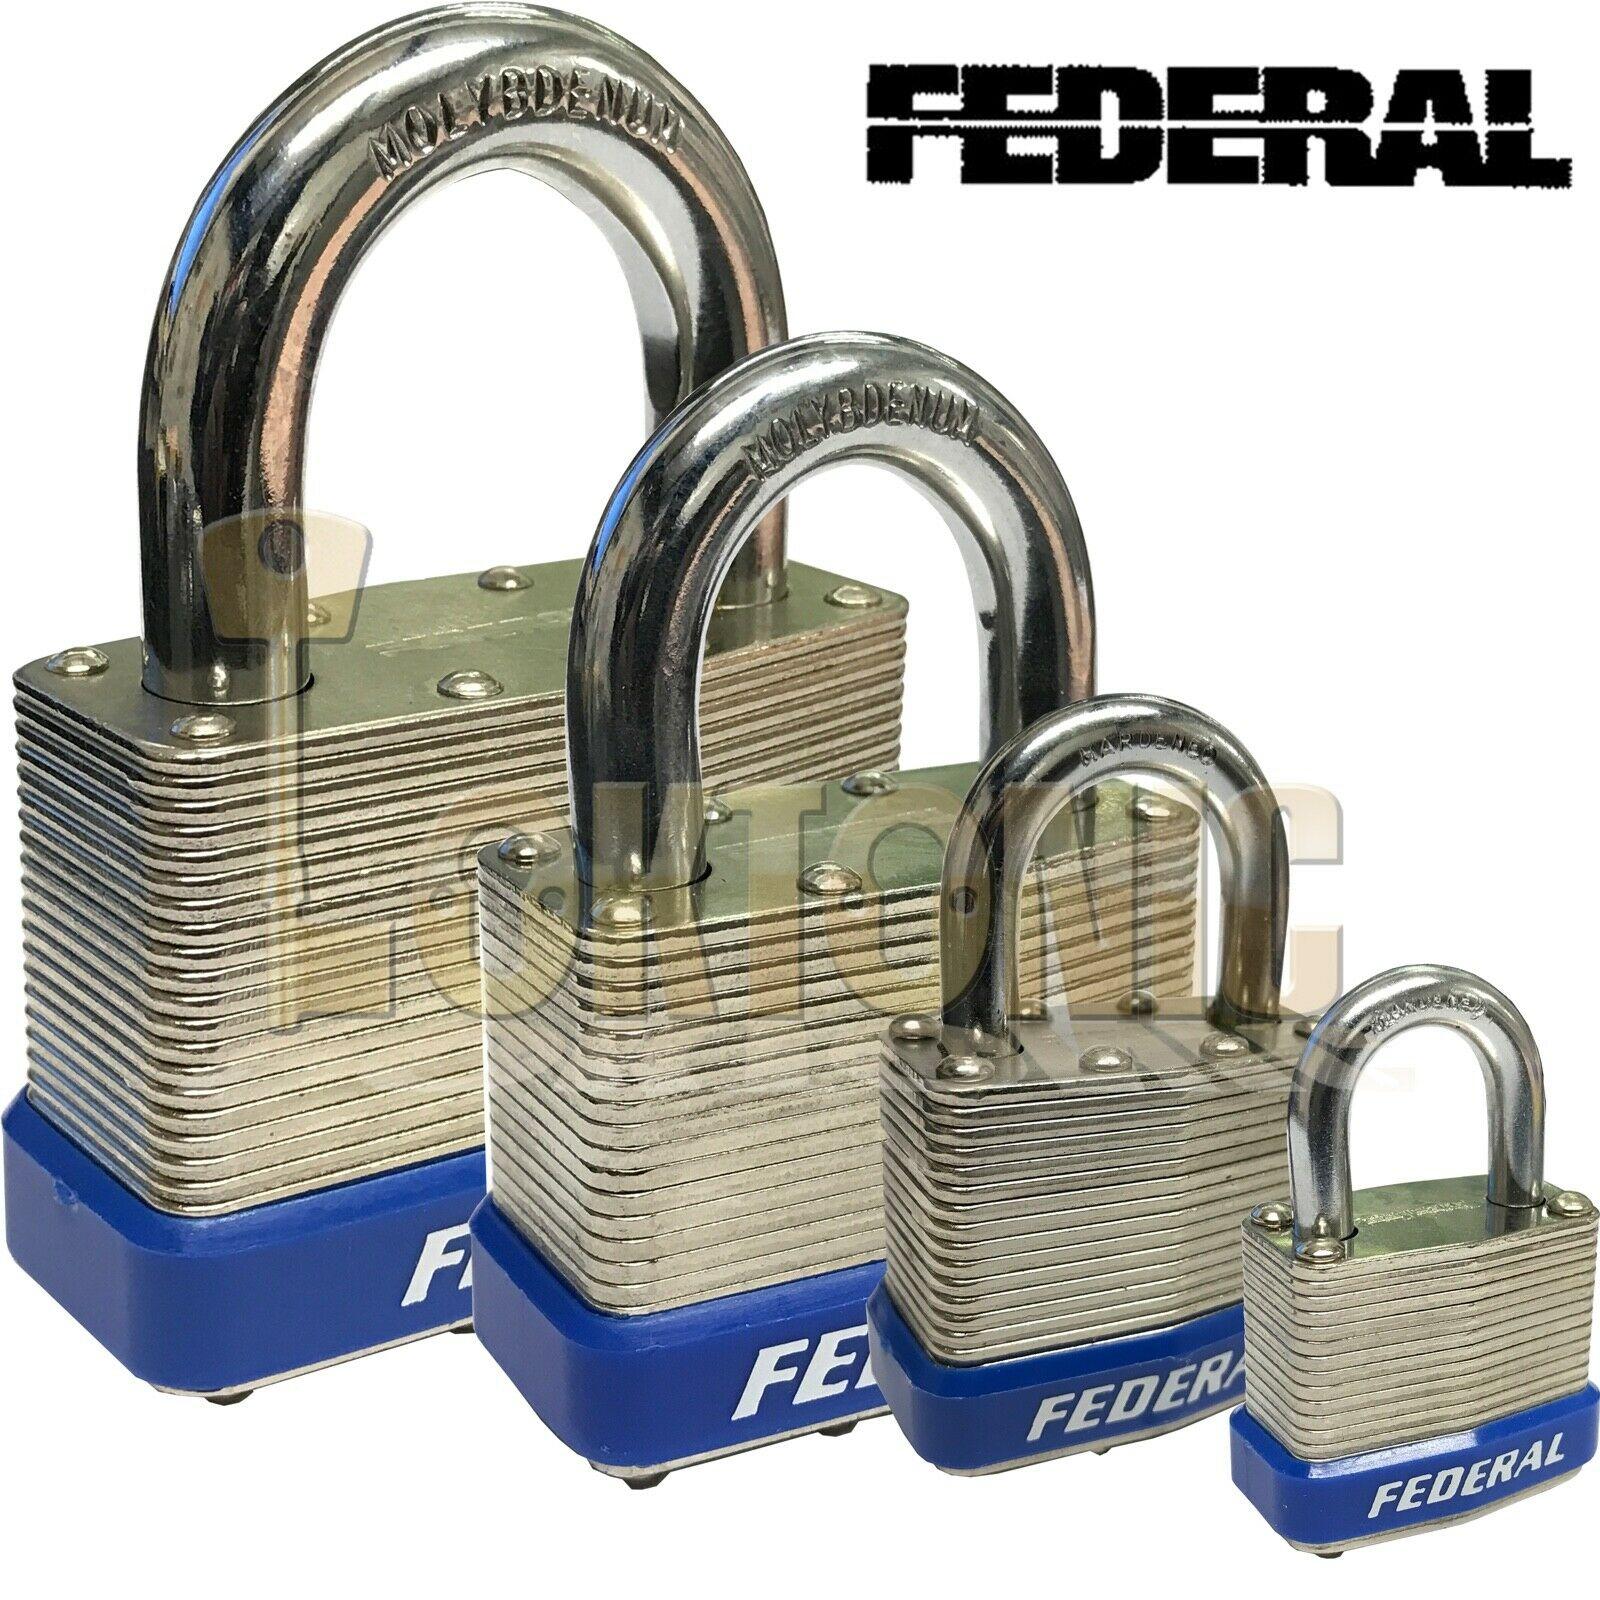 Federal High Security Laminated Steel Padlocks Sheds Vans Gates